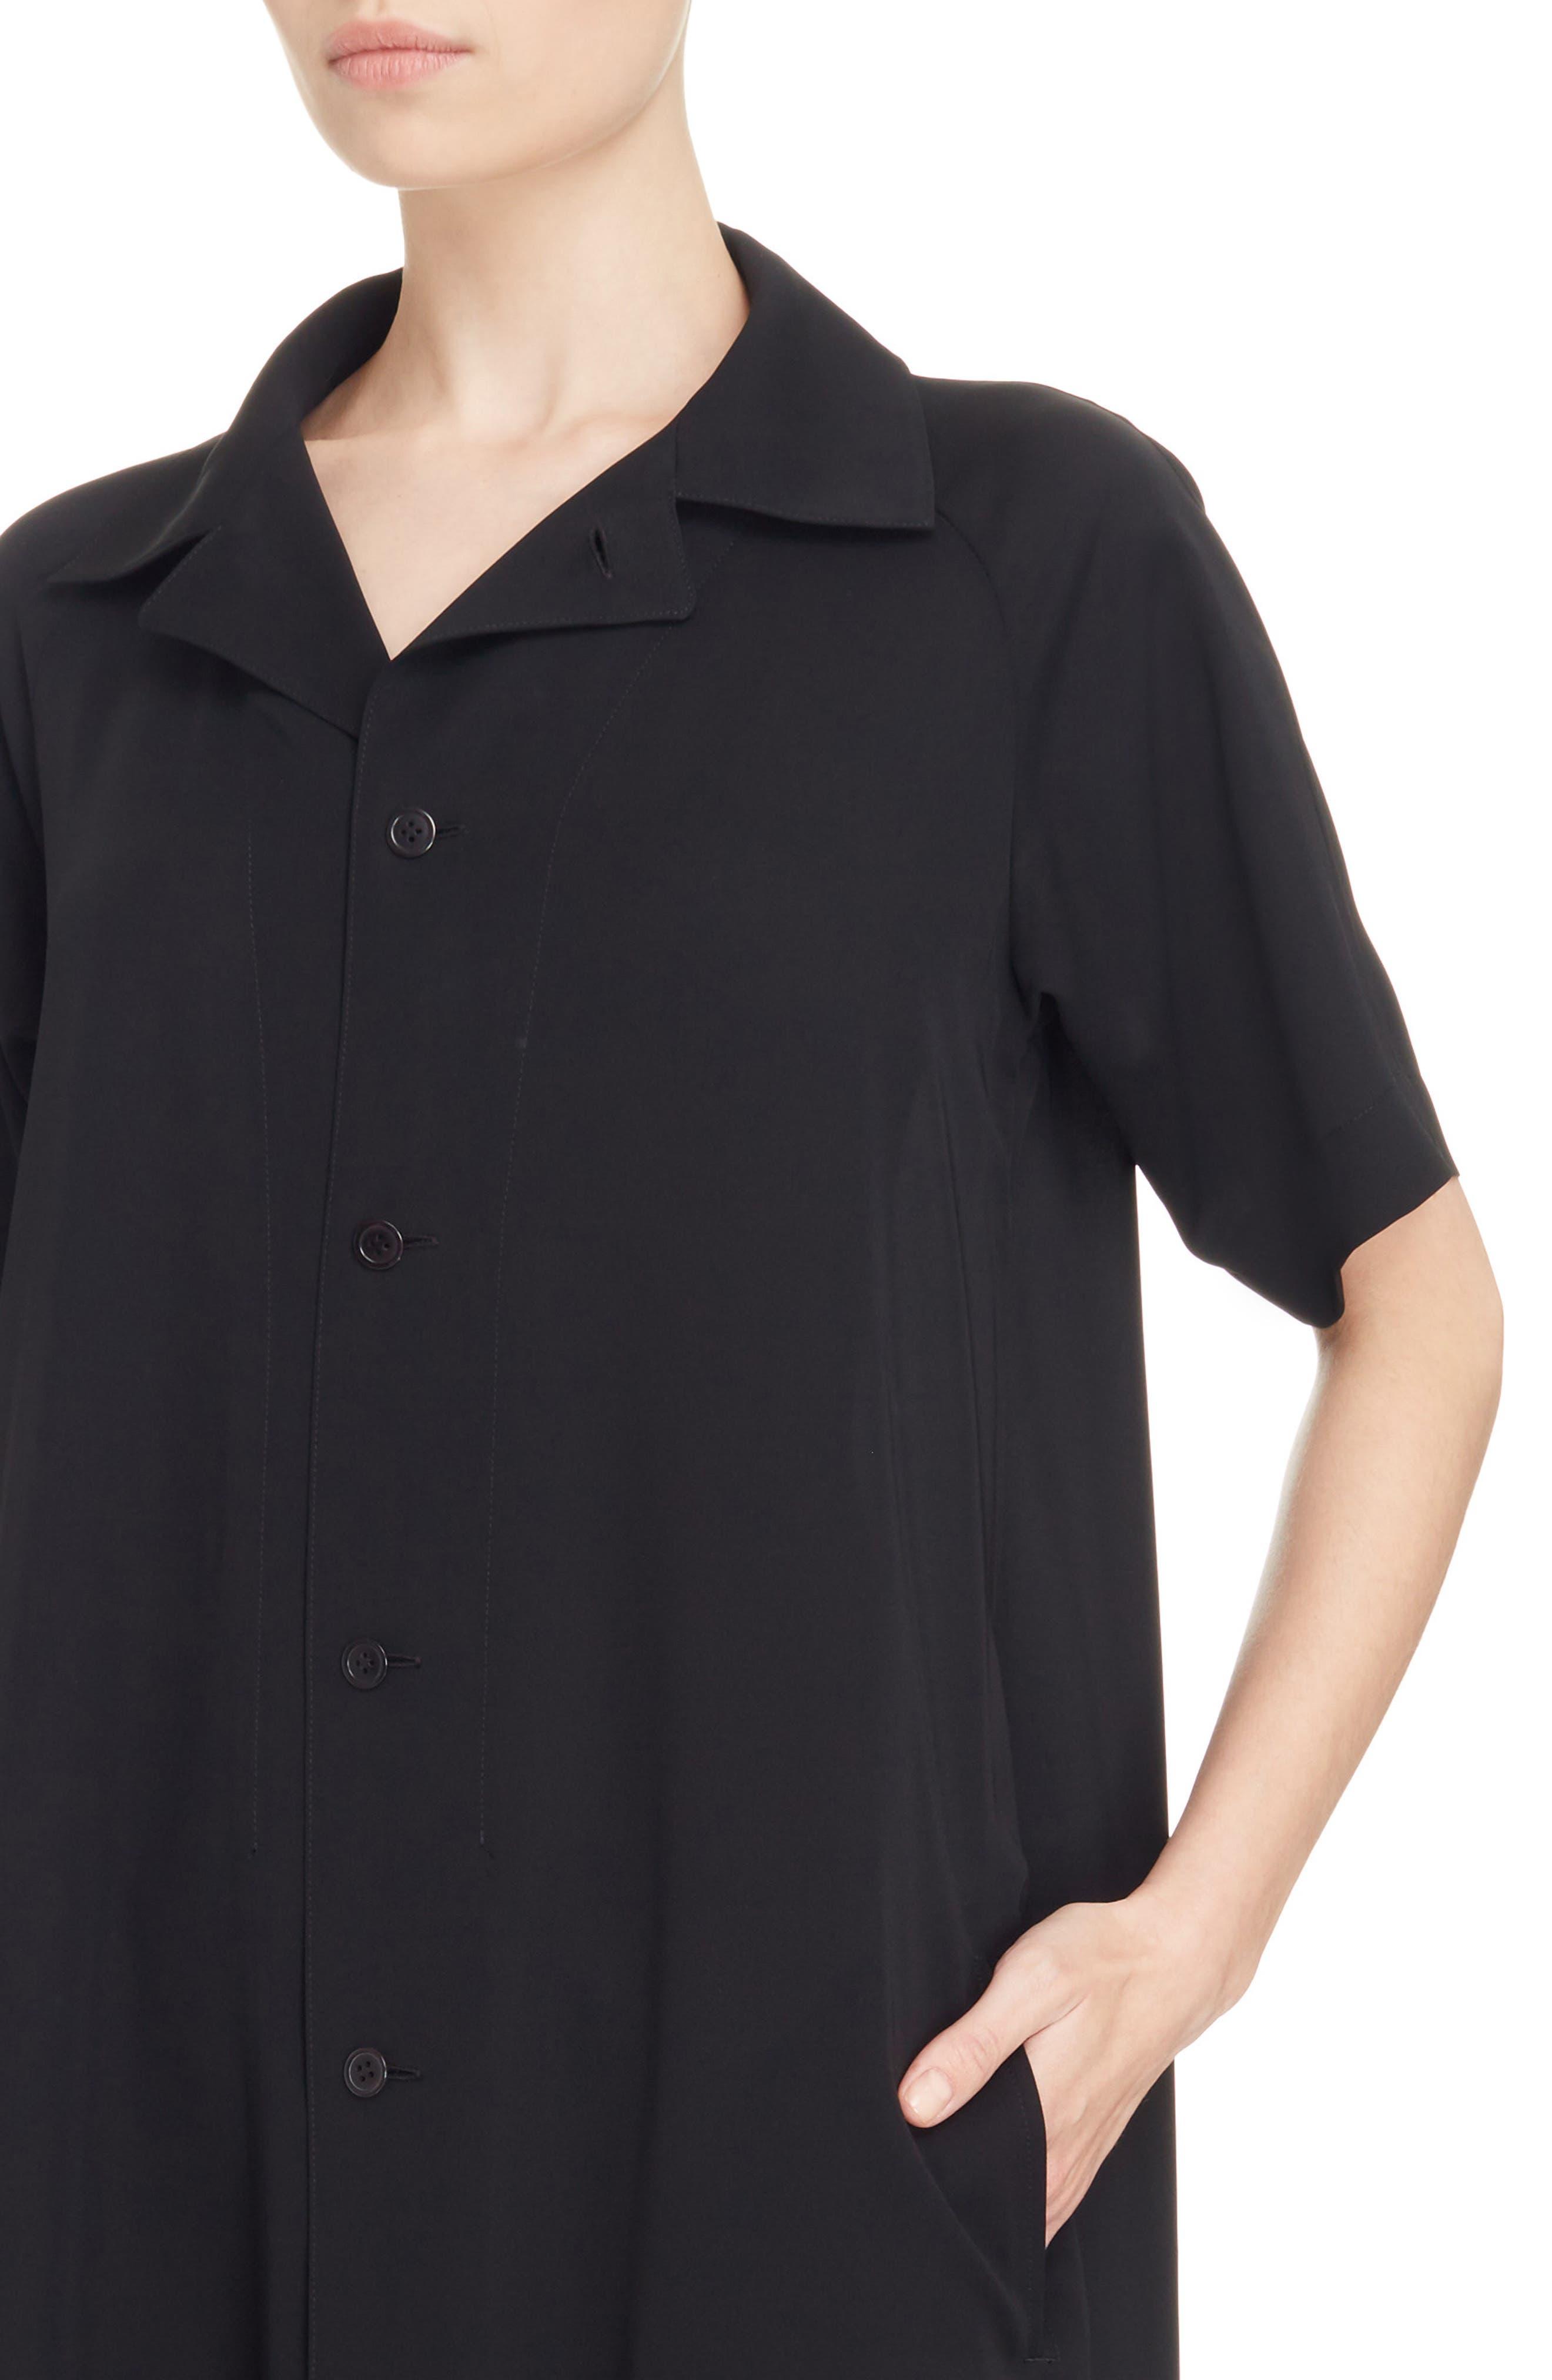 Oversize Shirtdress,                             Alternate thumbnail 4, color,                             001